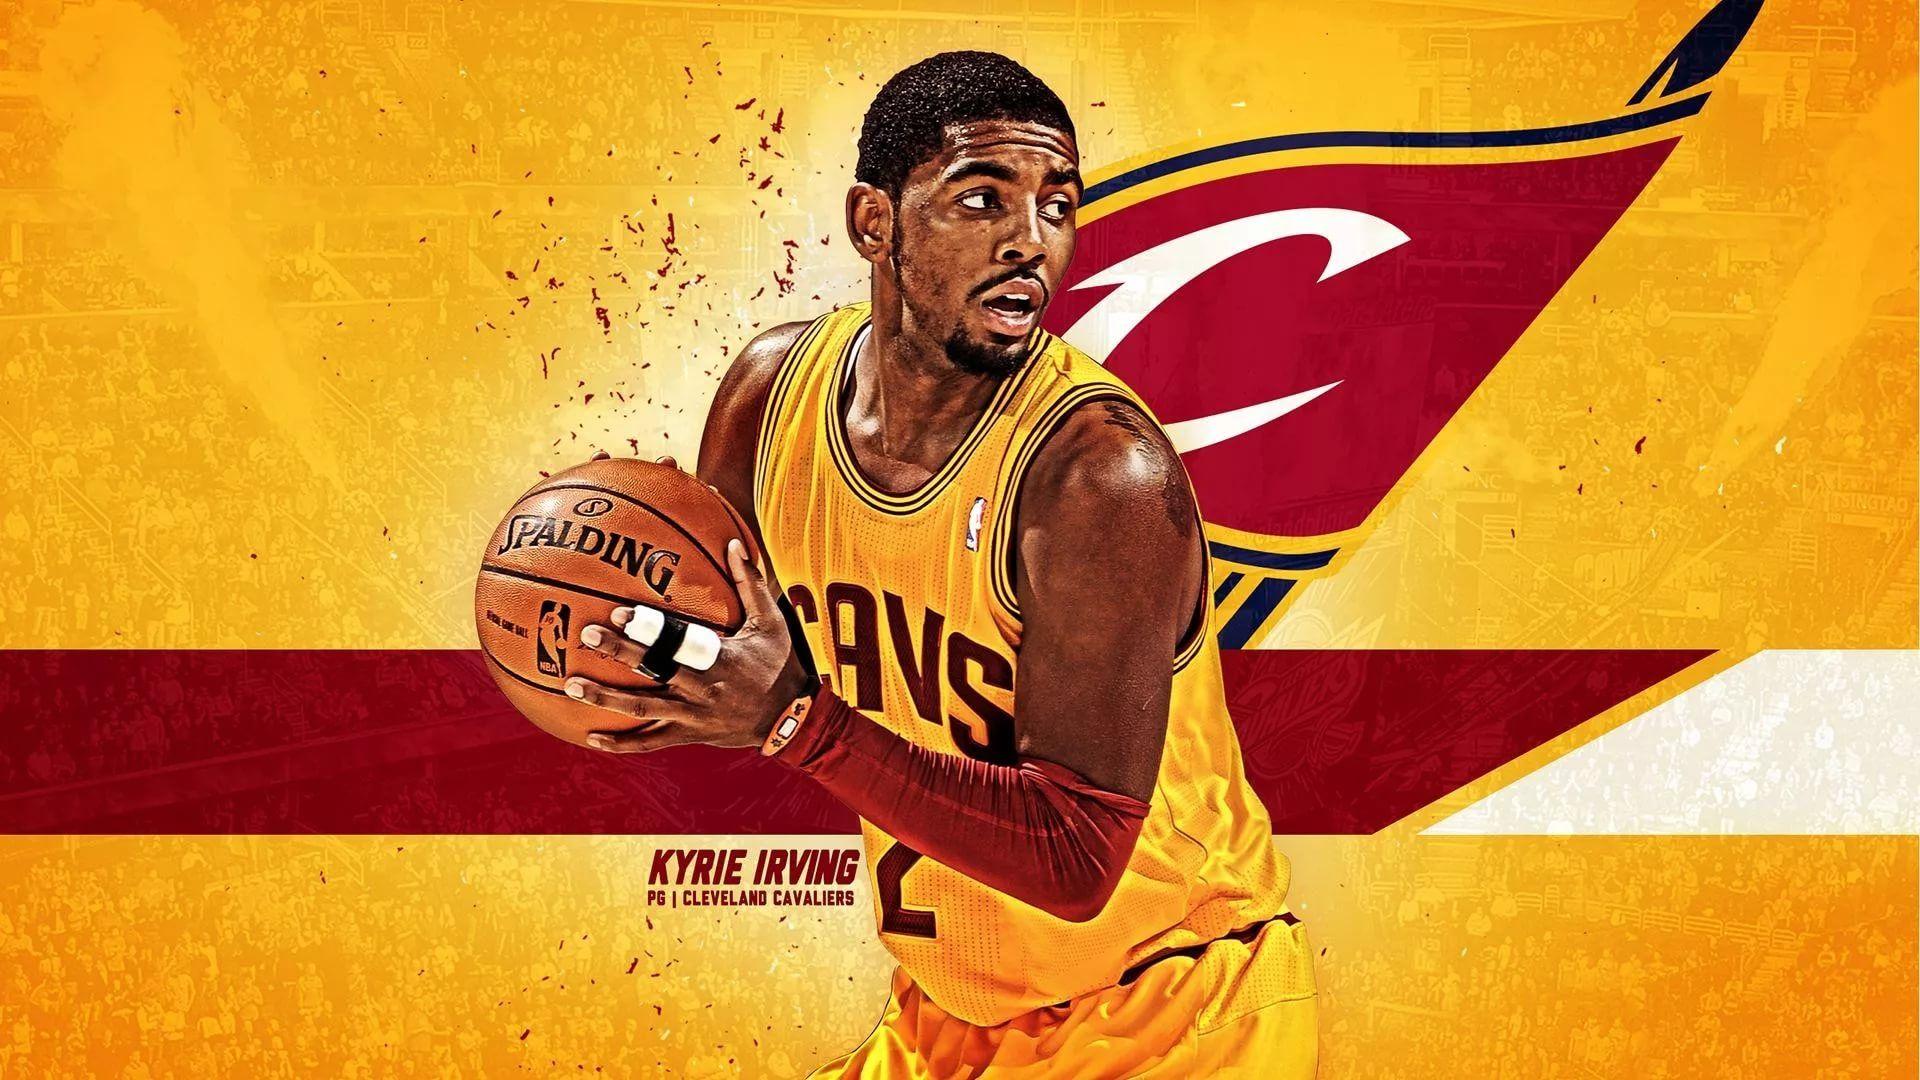 Cleveland Background Wallpaper